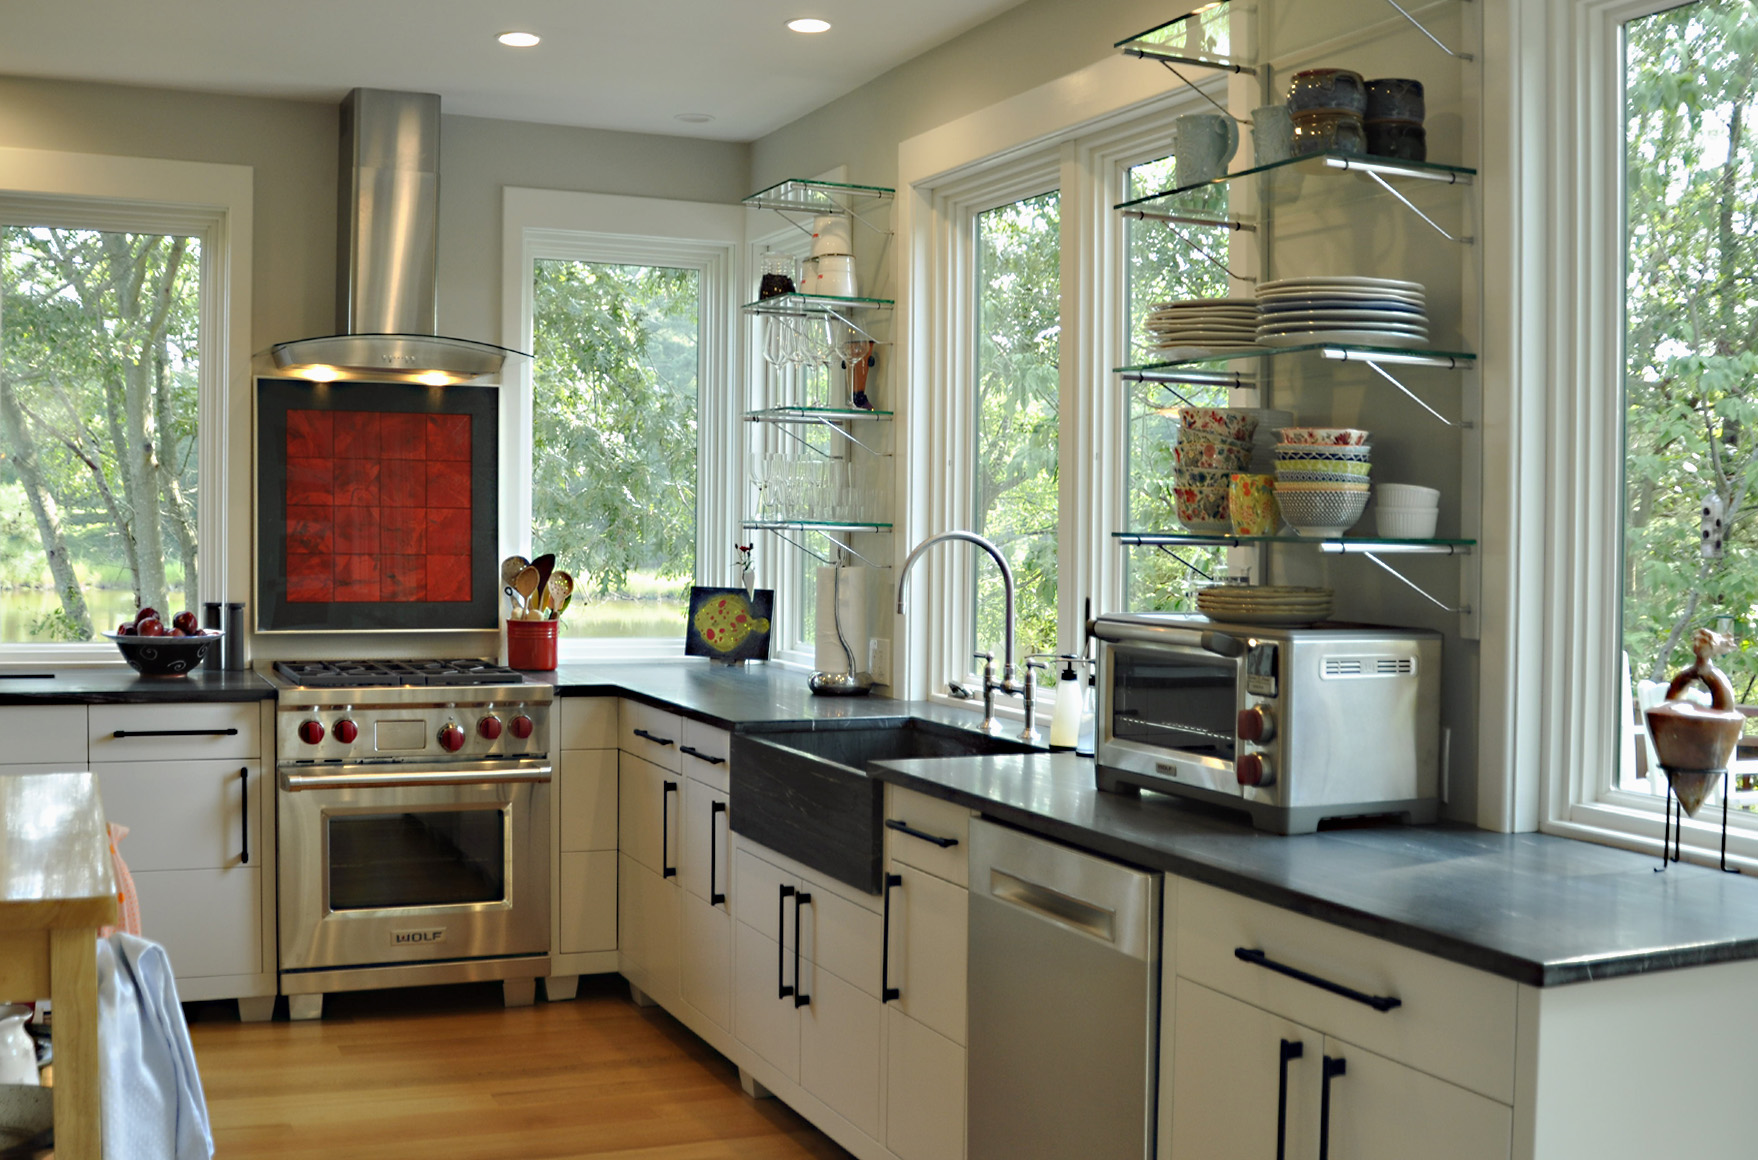 4. Eastern  Shore 2019 Grace Ames House kitchen.jpg